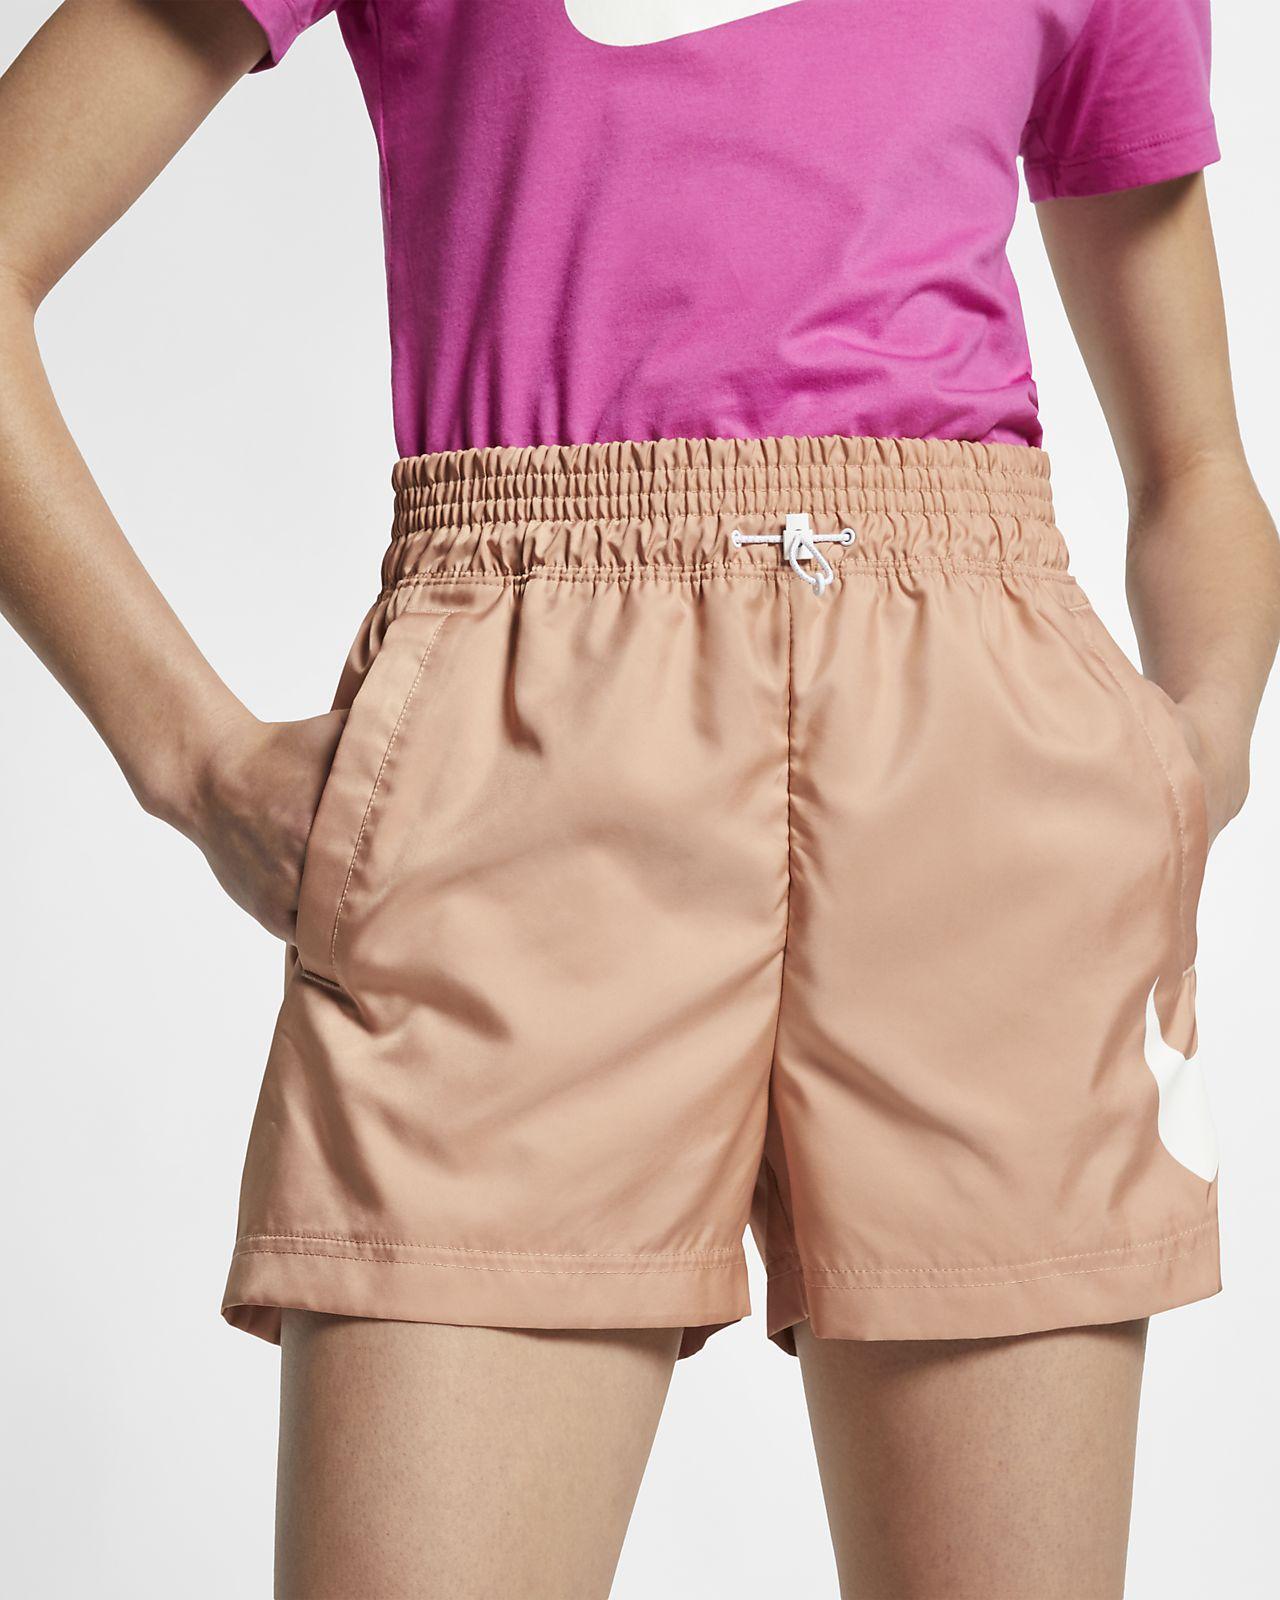 22b809f3 Nike Sportswear Swoosh Women's Woven Shorts. Nike.com SE